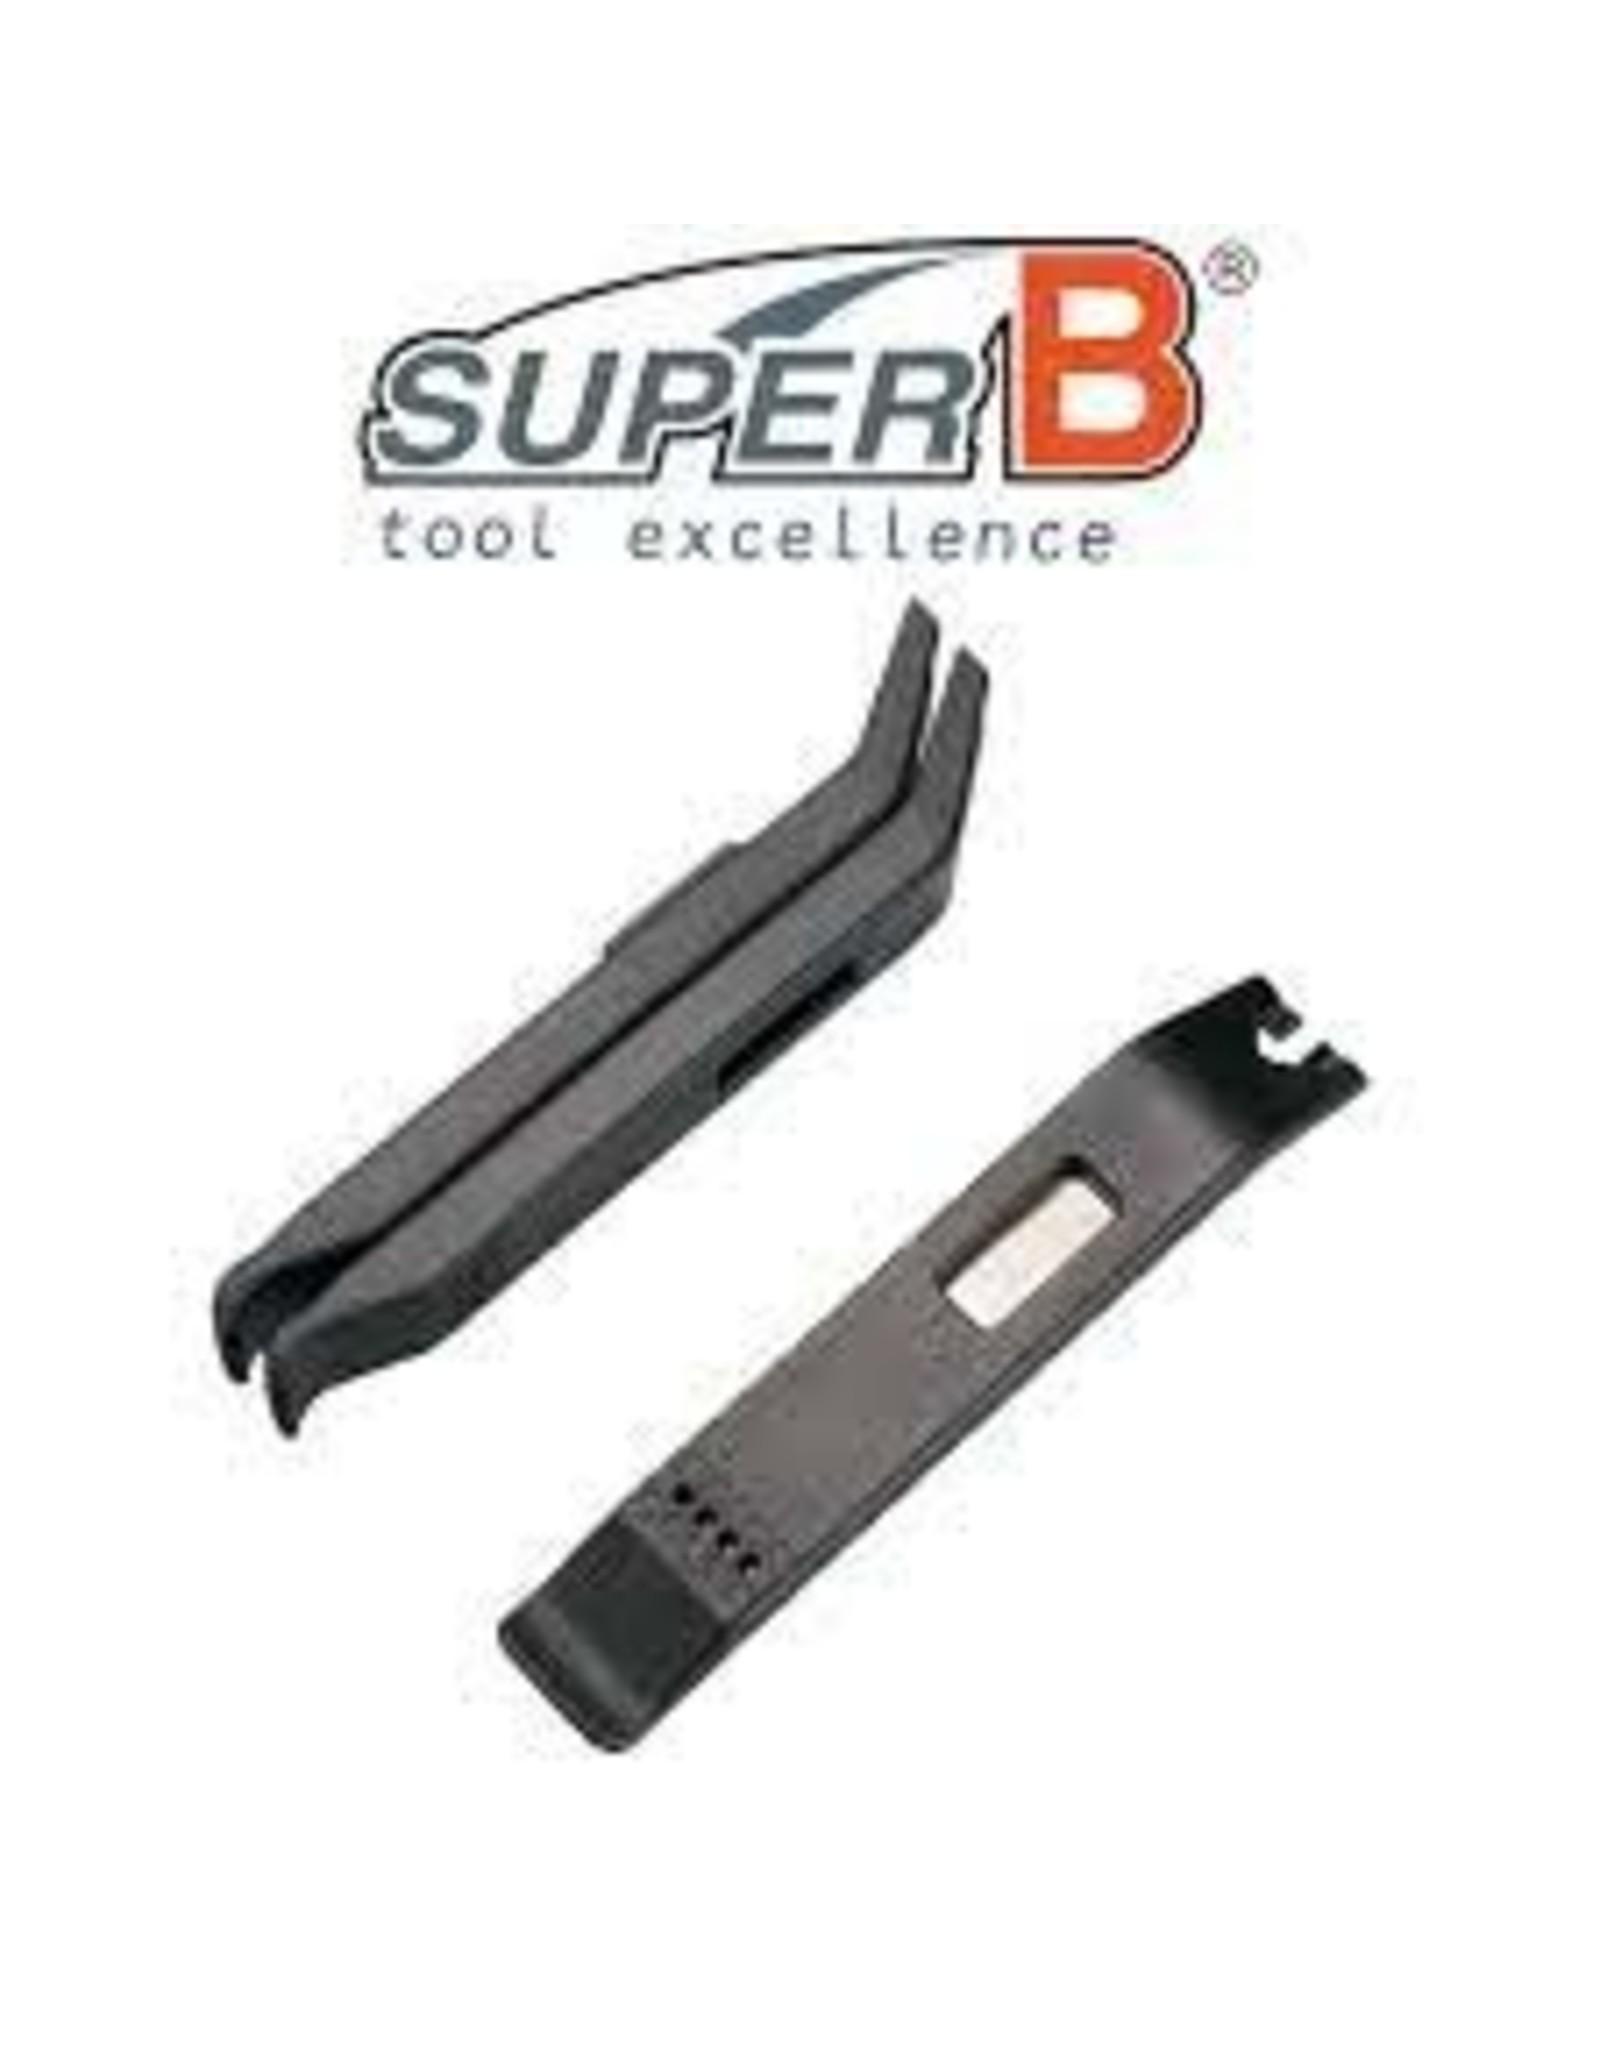 SUPER B TOOLS SB STEEL CORE TIRE LEVRER 3PC